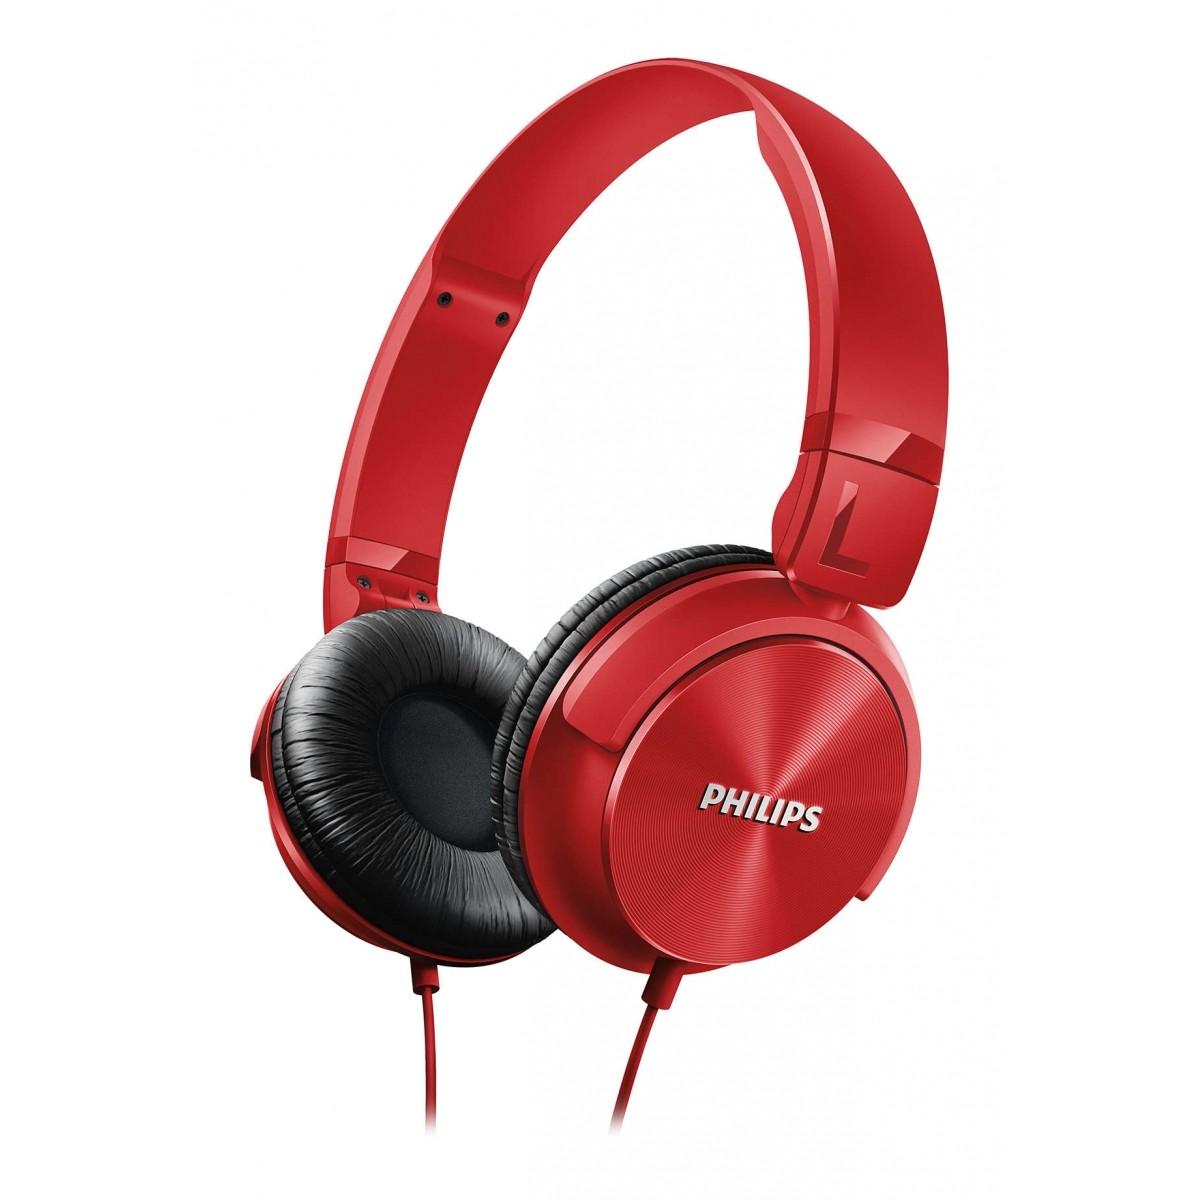 Fone de Ouvido Headphone Philips Headband DJ Vermelho - SHL3060RD